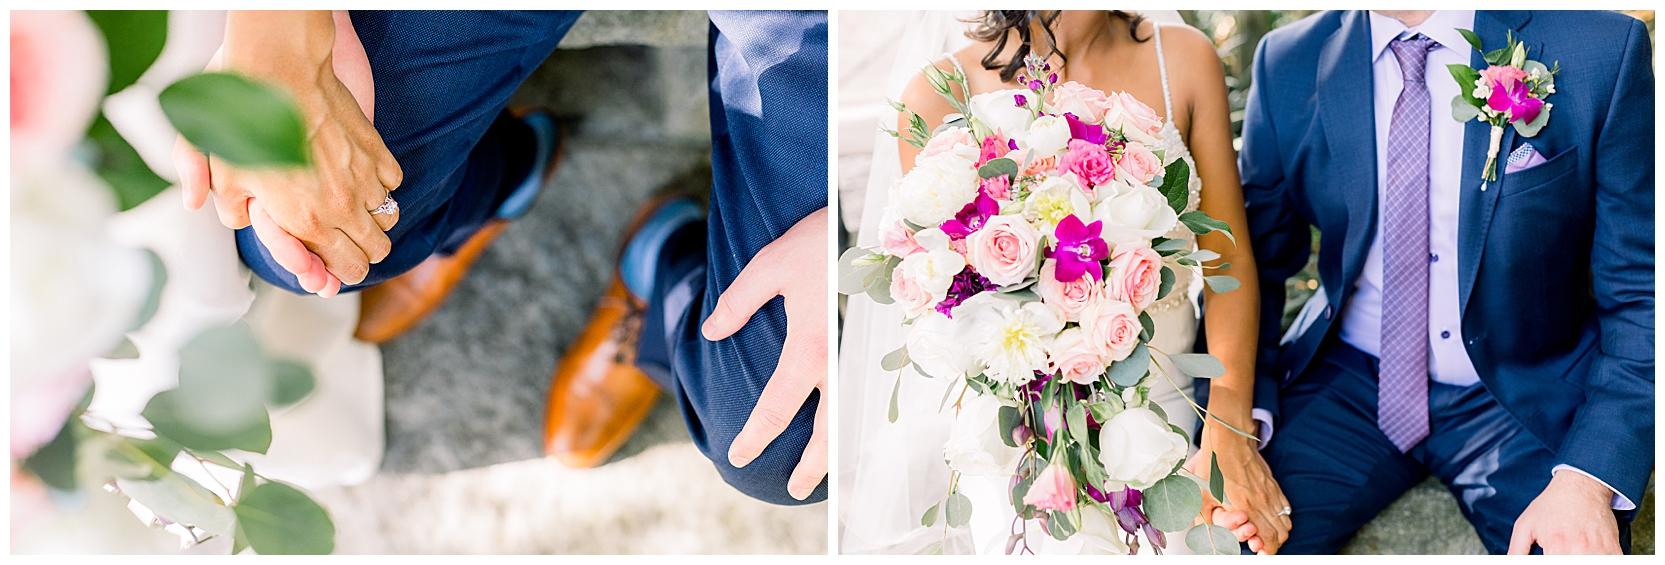 jessicafredericks_lakeland_tampa_wedding_purple_crazy hour_0029.jpg